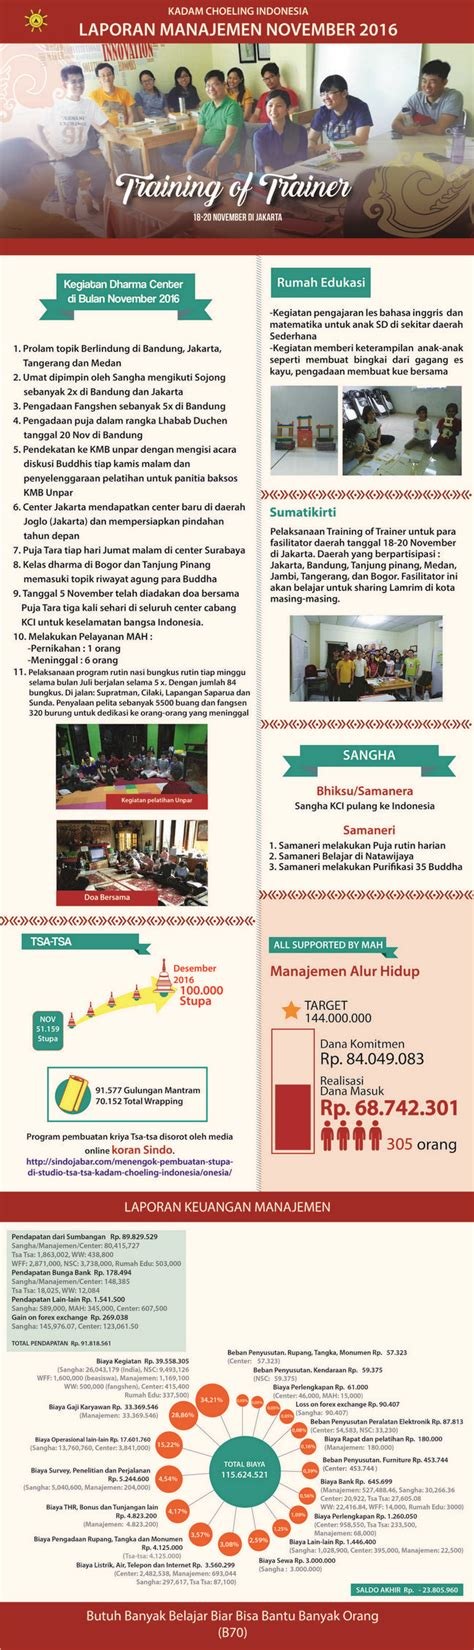 laporan manajemen layout laporan manajemen kadam choeling indonesia november 2016